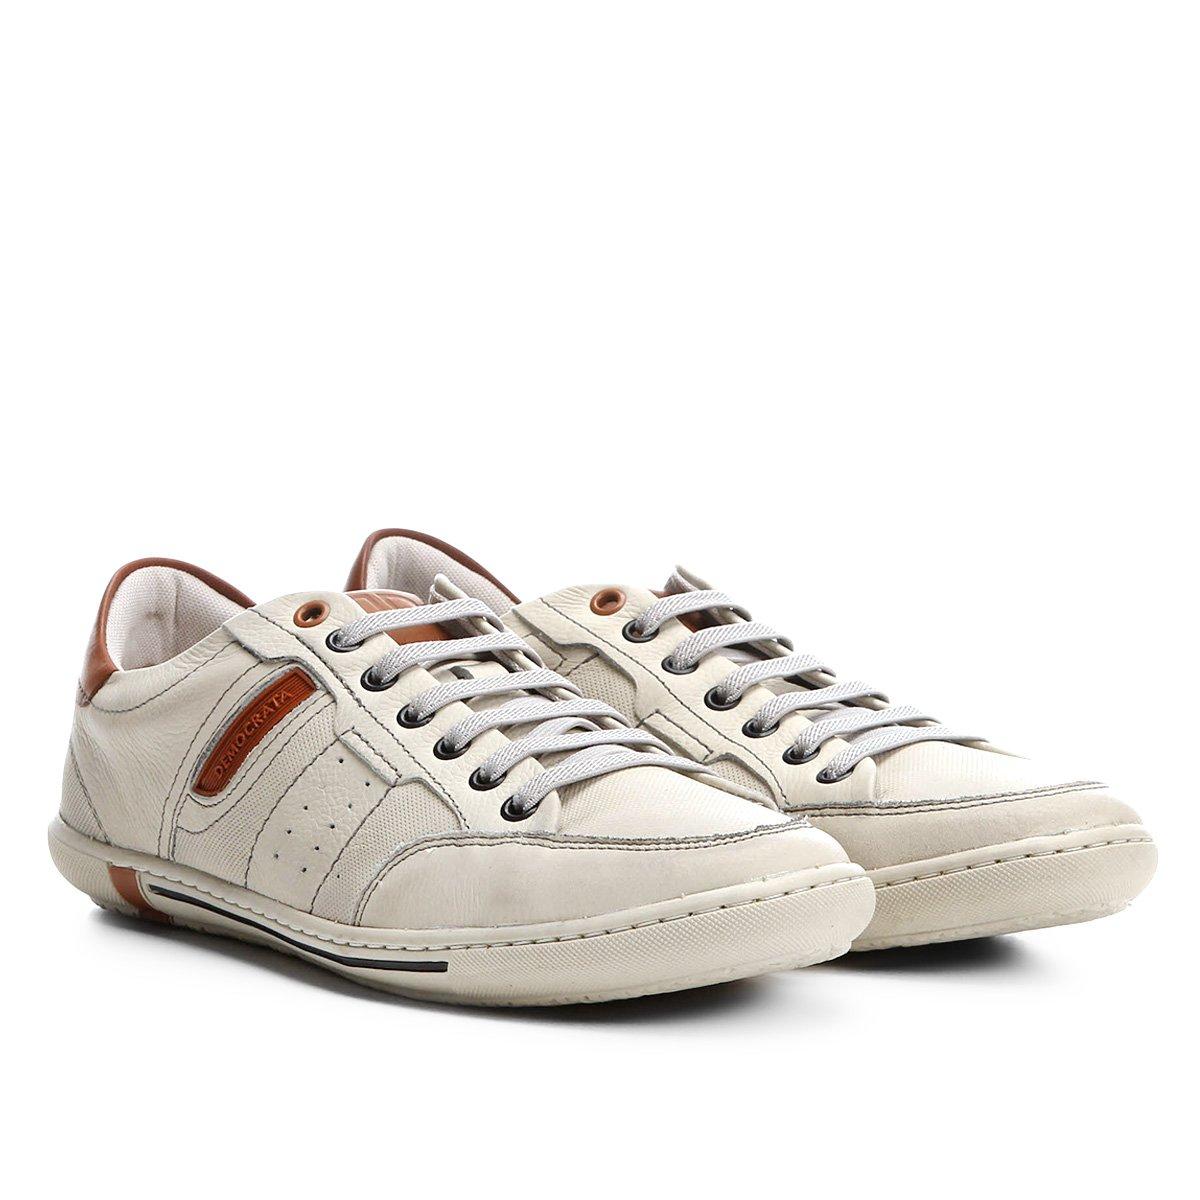 1811f84870 FornecedorNetshoes. Sapatênis Couro Democrata Lucky Masculino